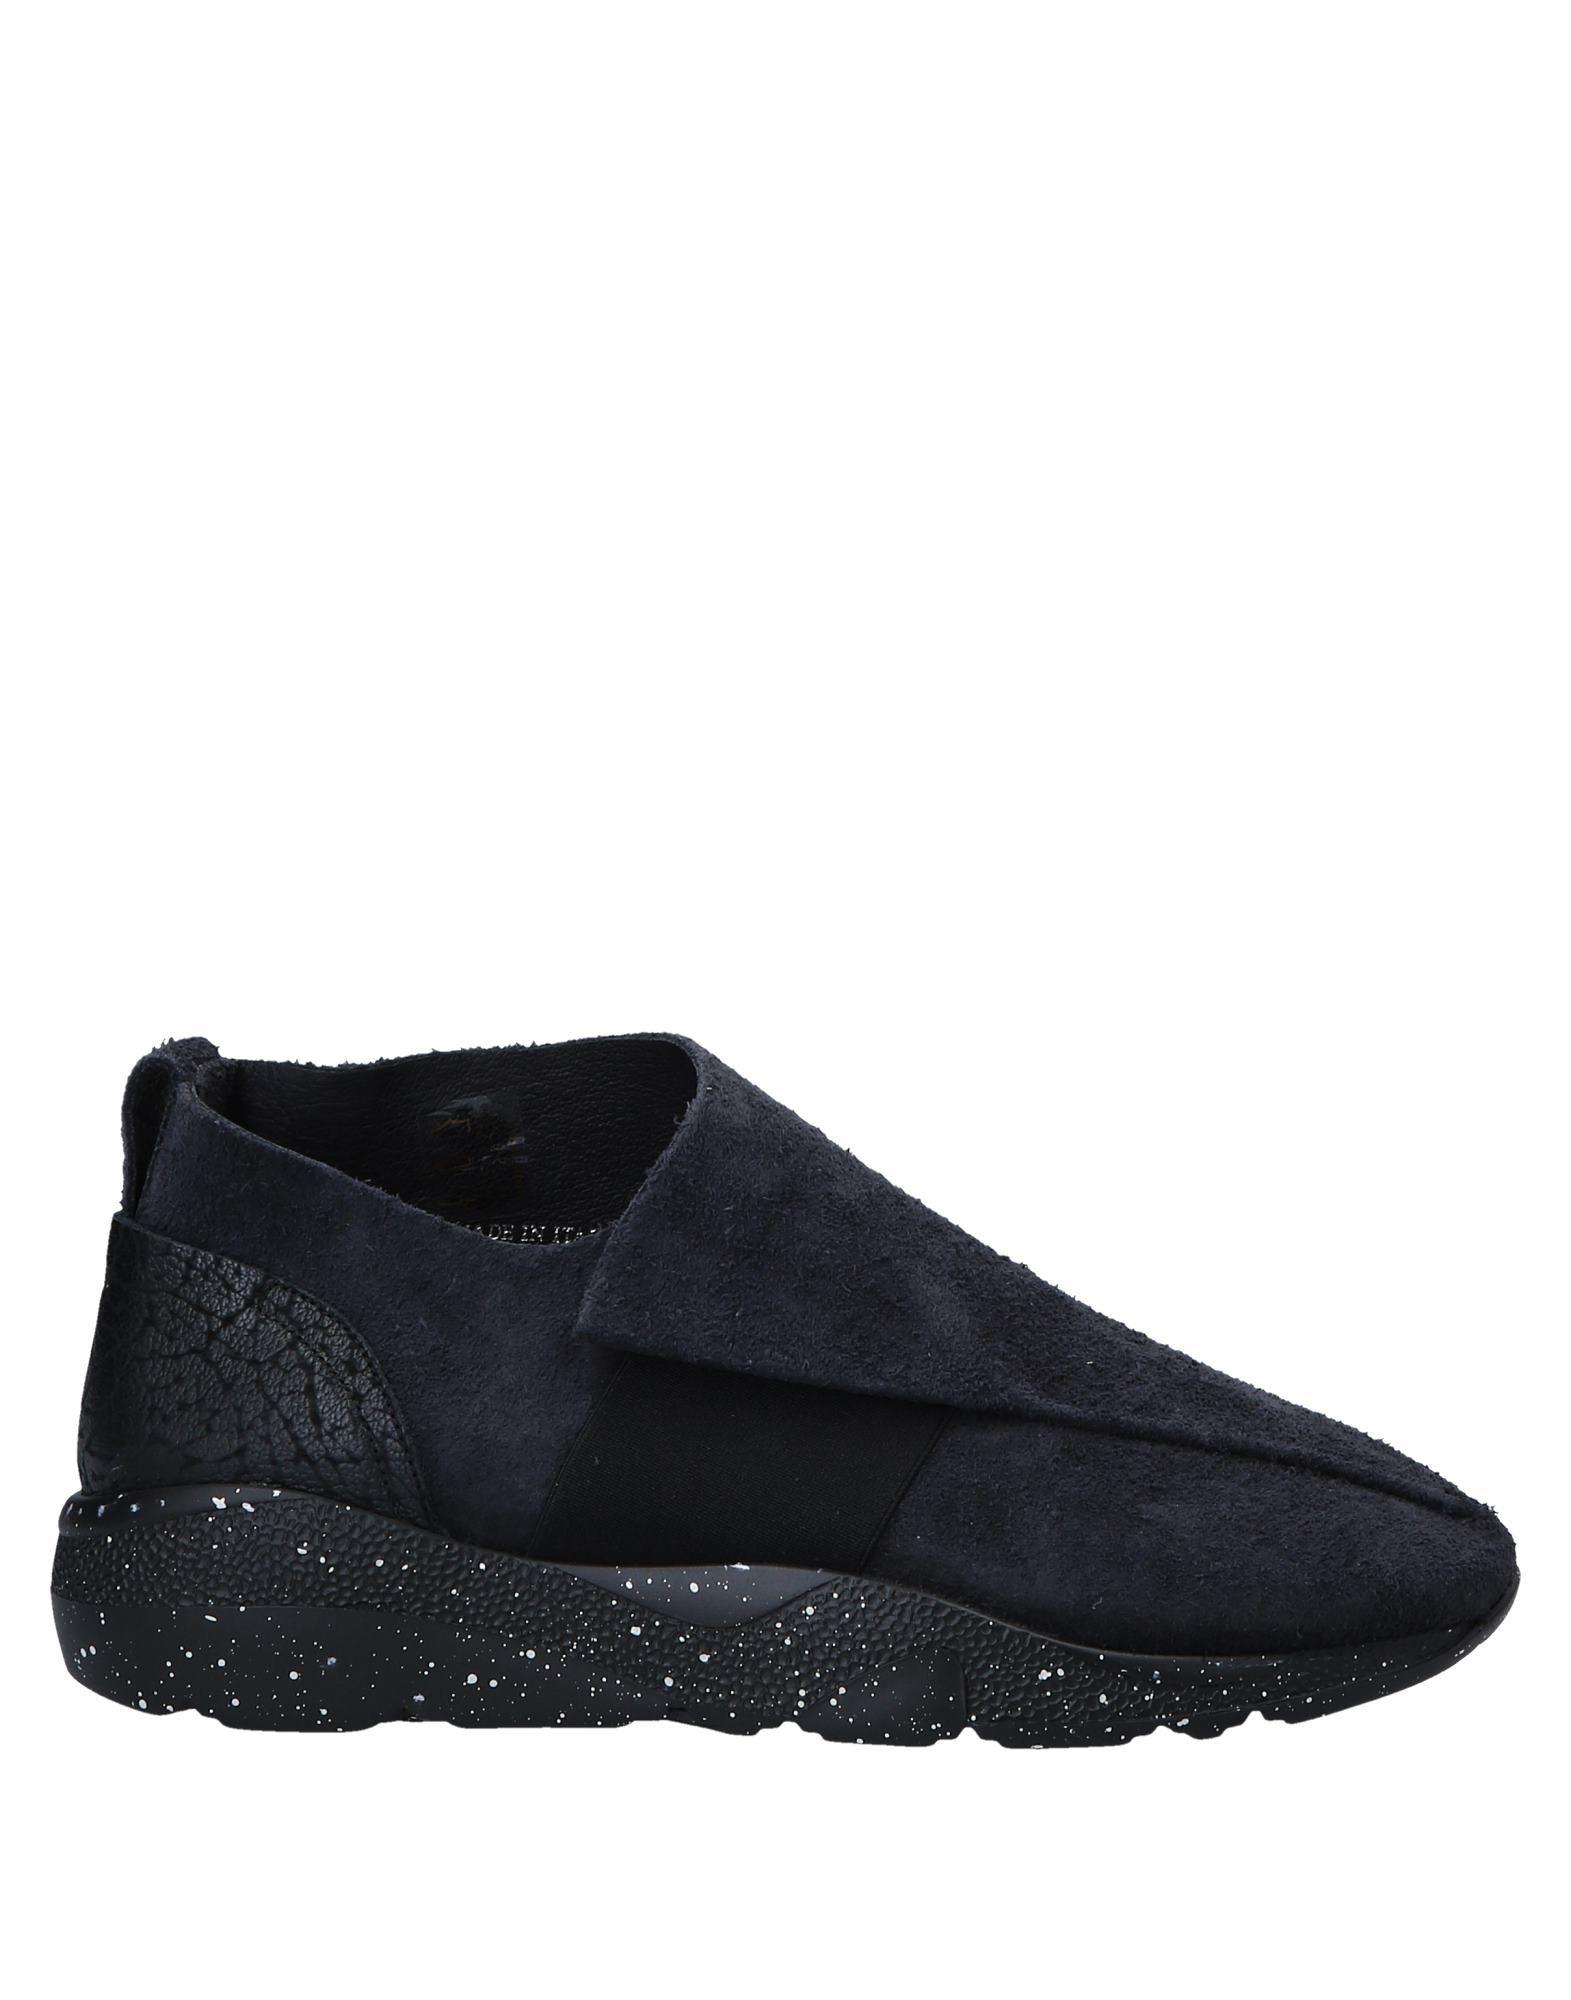 Casbia Sneakers Herren  11552823LV Gute Qualität beliebte Schuhe